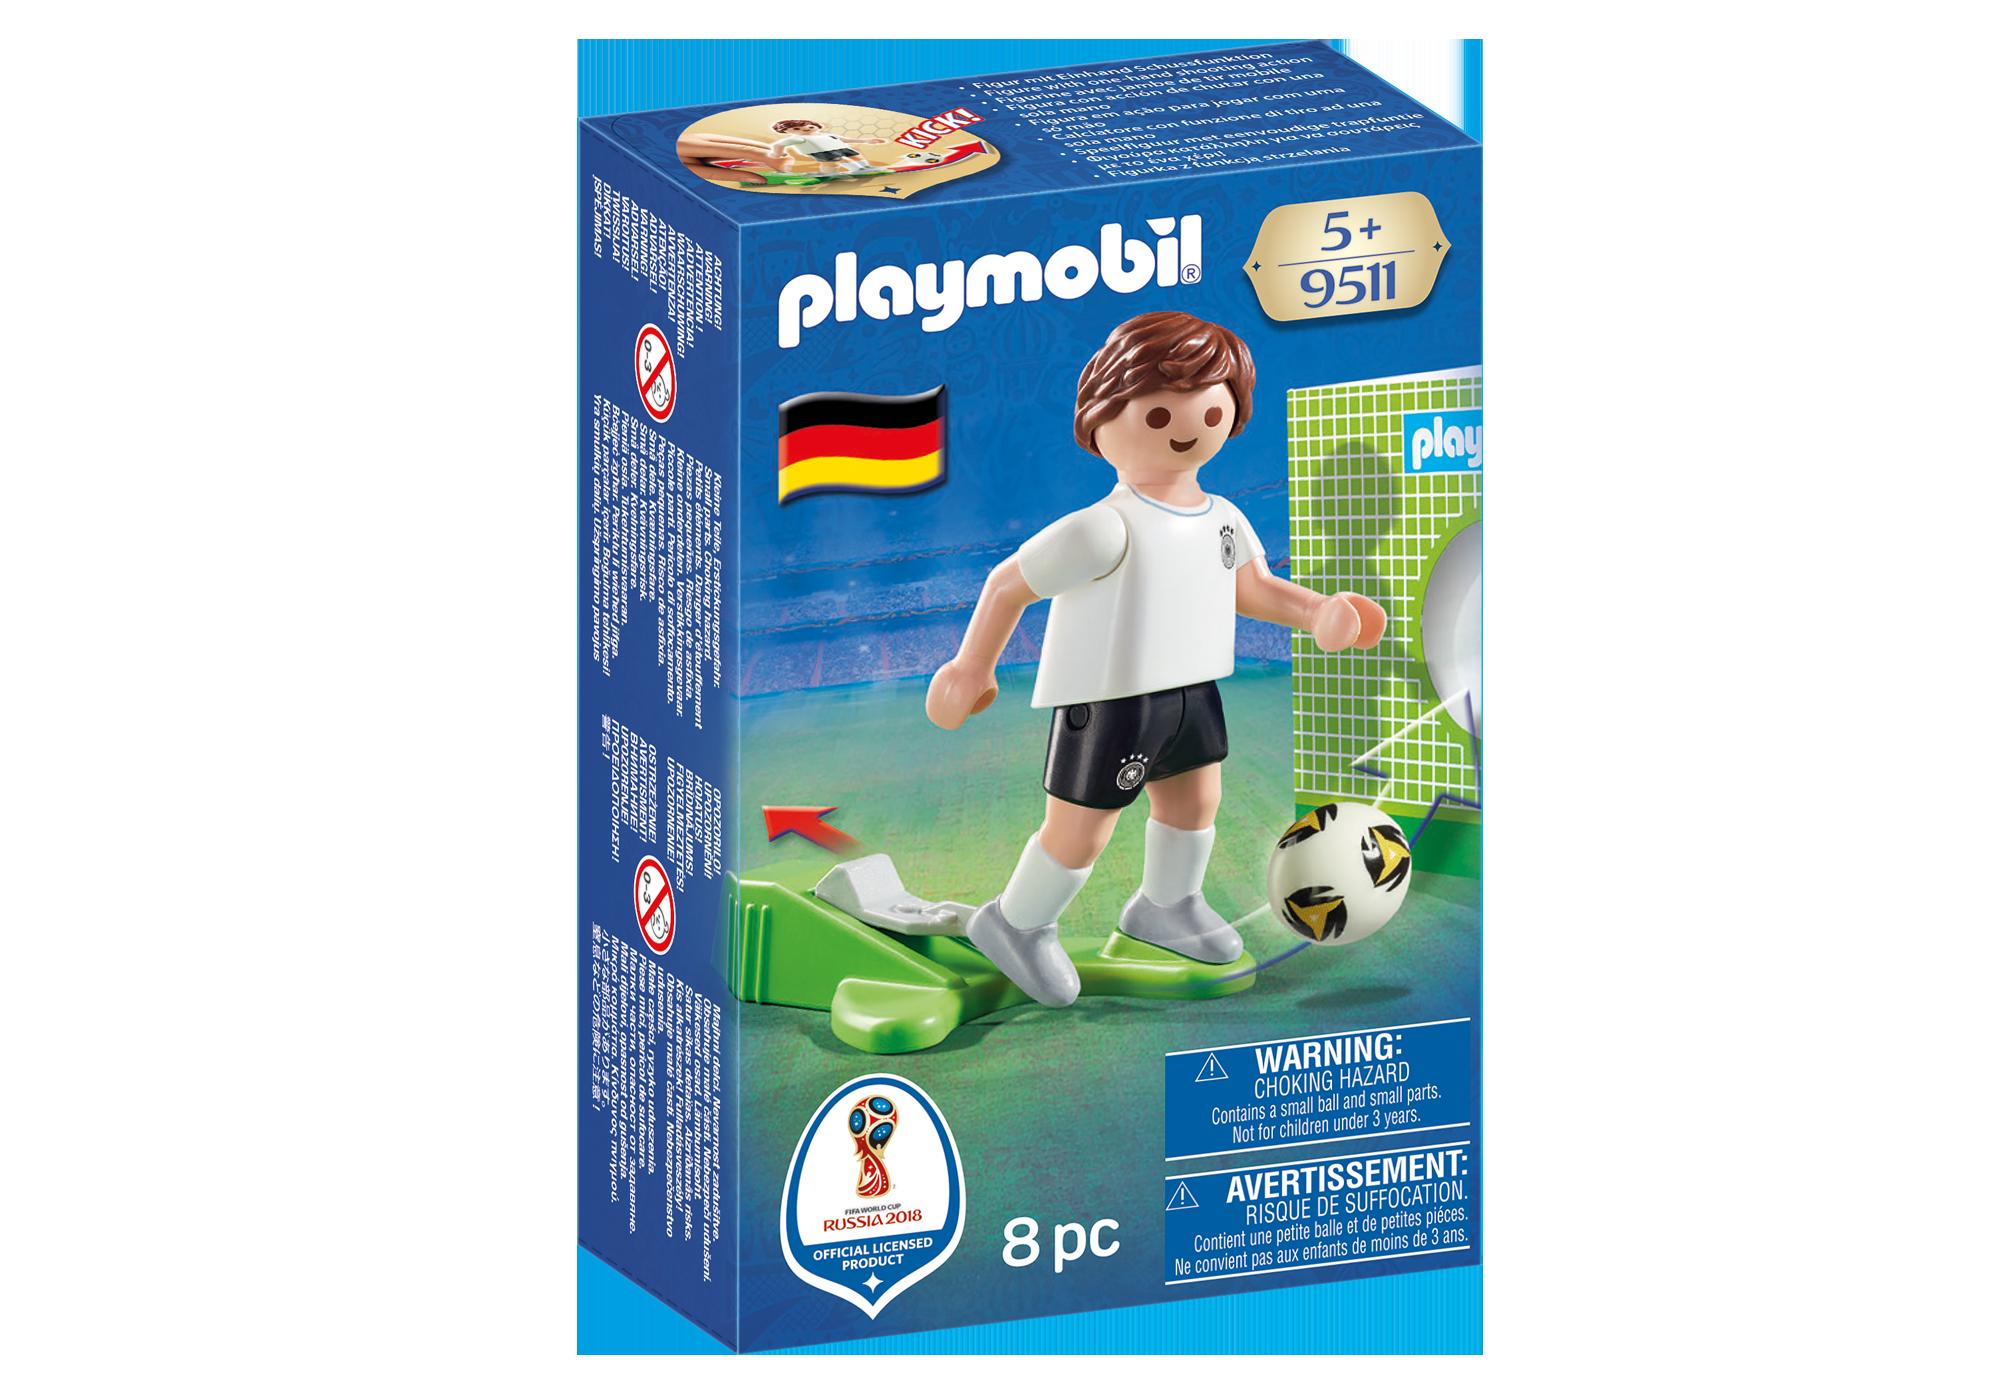 http://media.playmobil.com/i/playmobil/9511_product_box_front